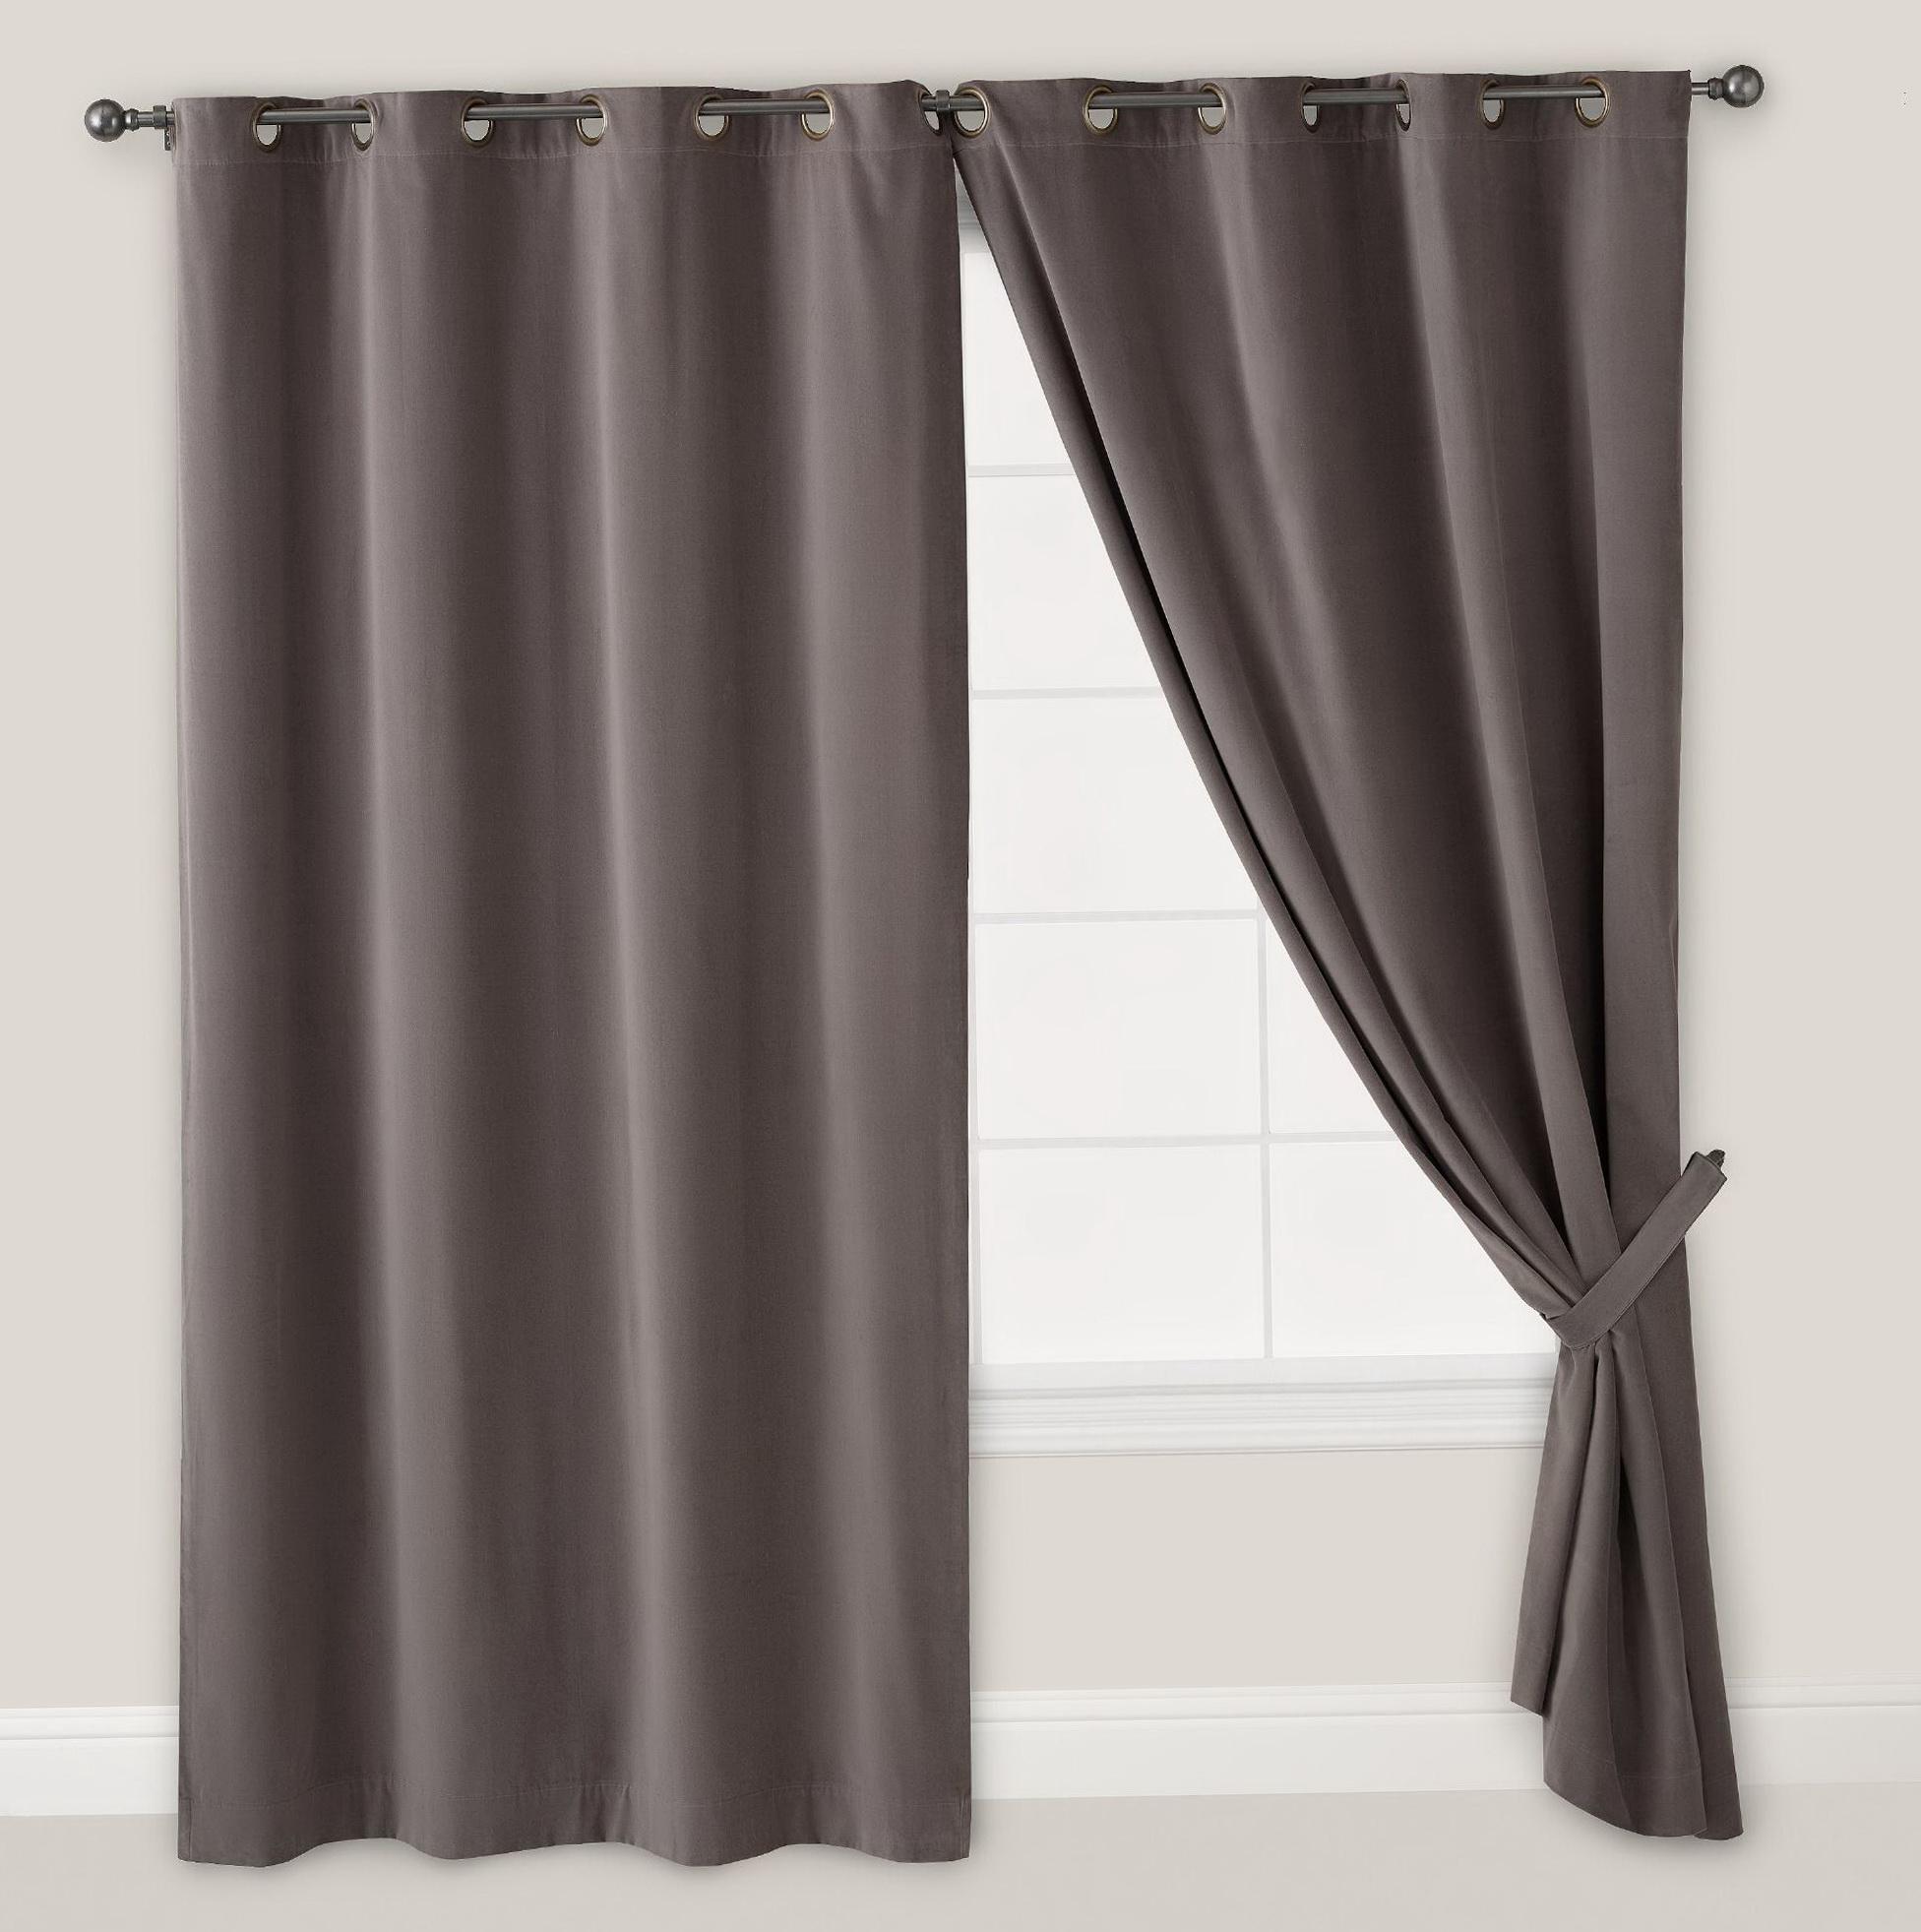 Grommet Top Curtains 108 Inch Home Design Ideas